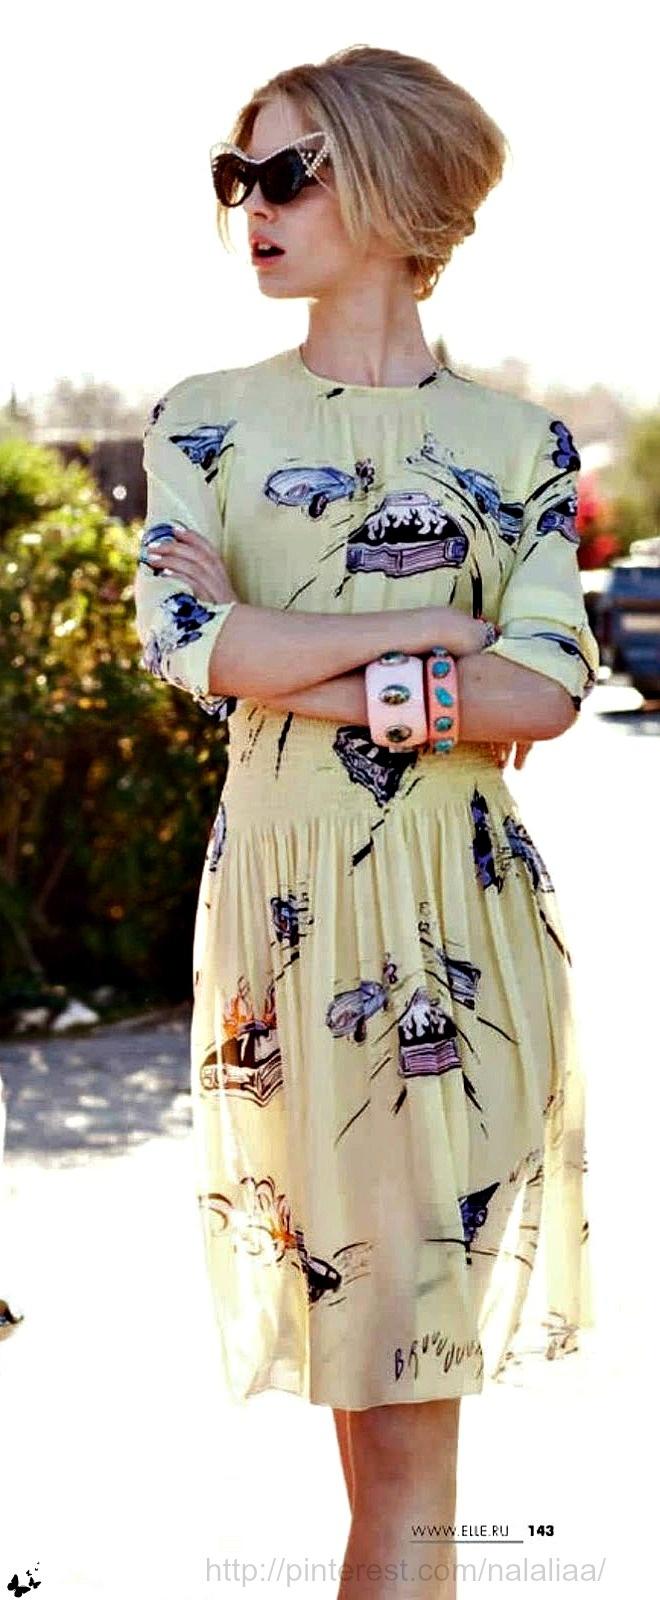 Skye Stracke by Kayt Jones for Elle Russia <3 na